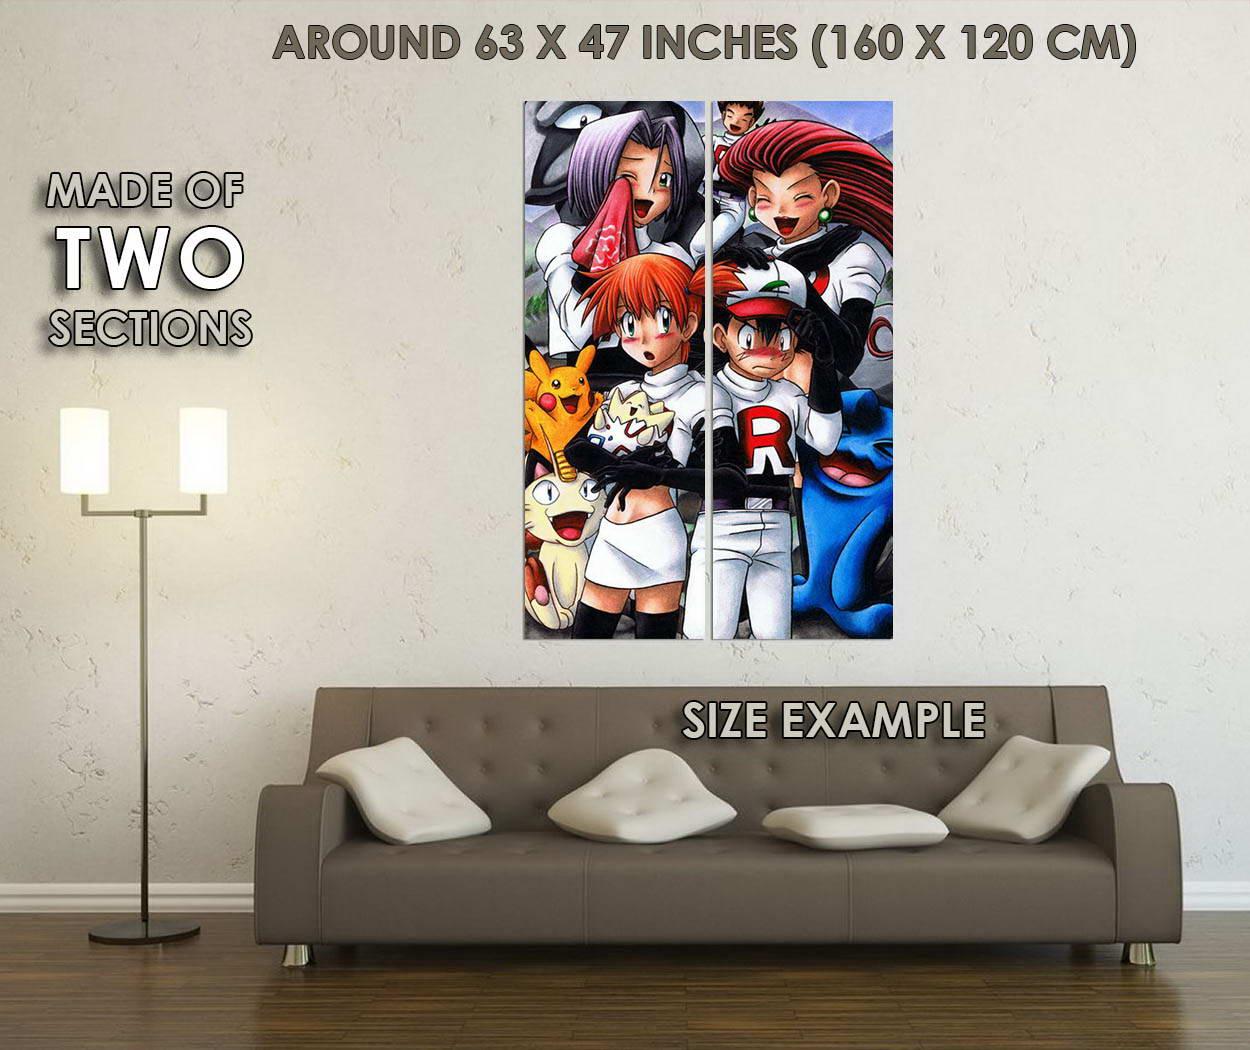 10612-Pocket-Monster-Pikachu-Anime-LAMINATED-POSTER-CA thumbnail 6